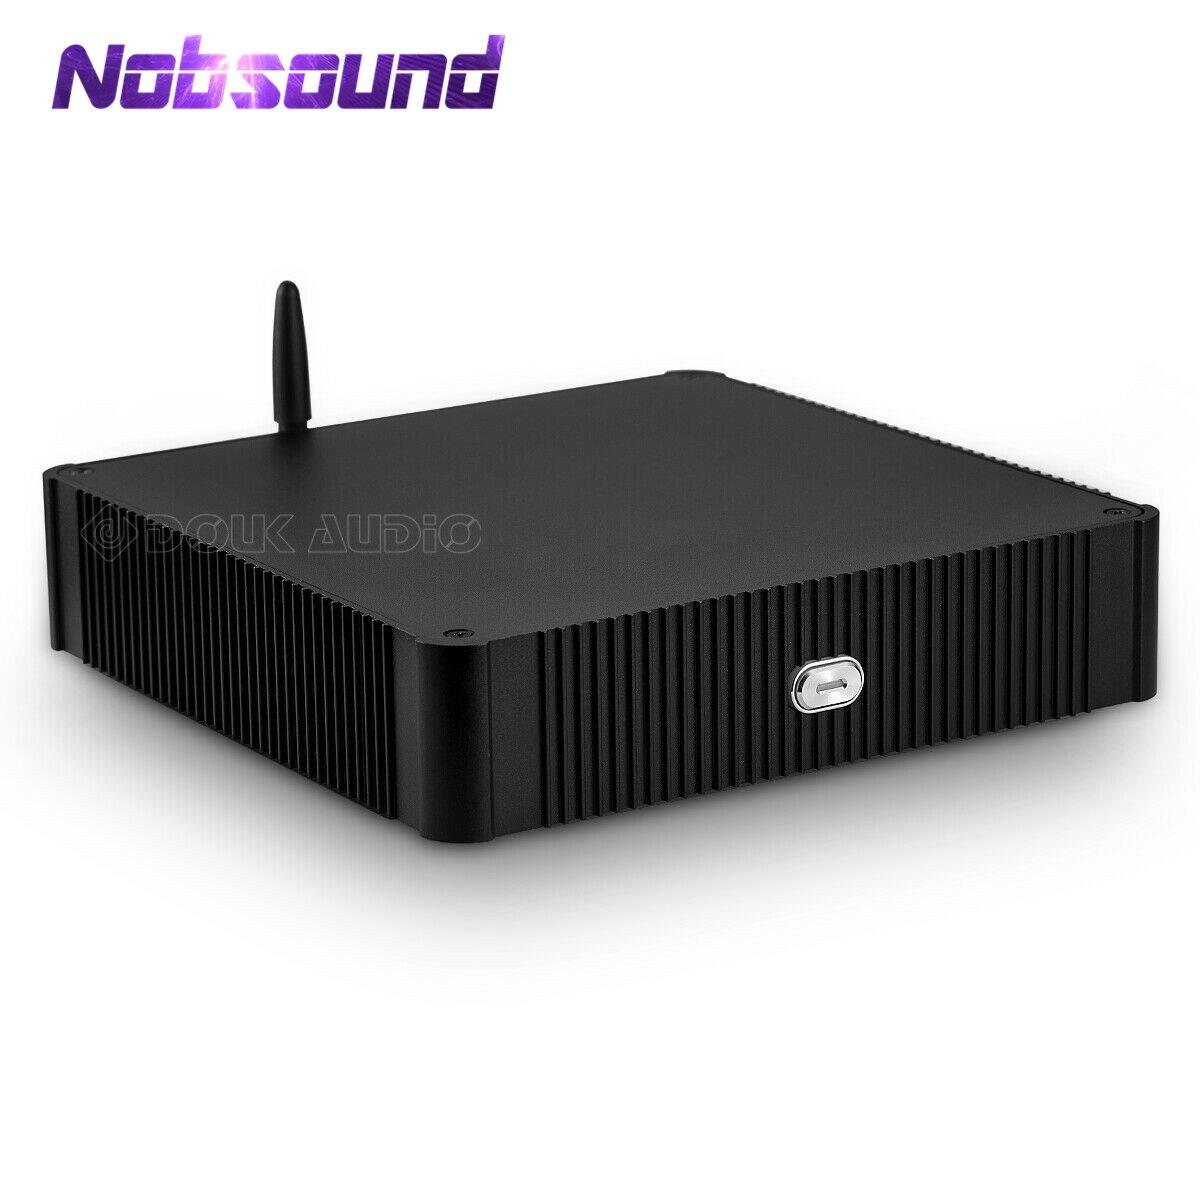 Nobsound HiFi Bluetooth 5.0 DAC LDAC Audio Decoder COAX/OPT Converter Digital Interface